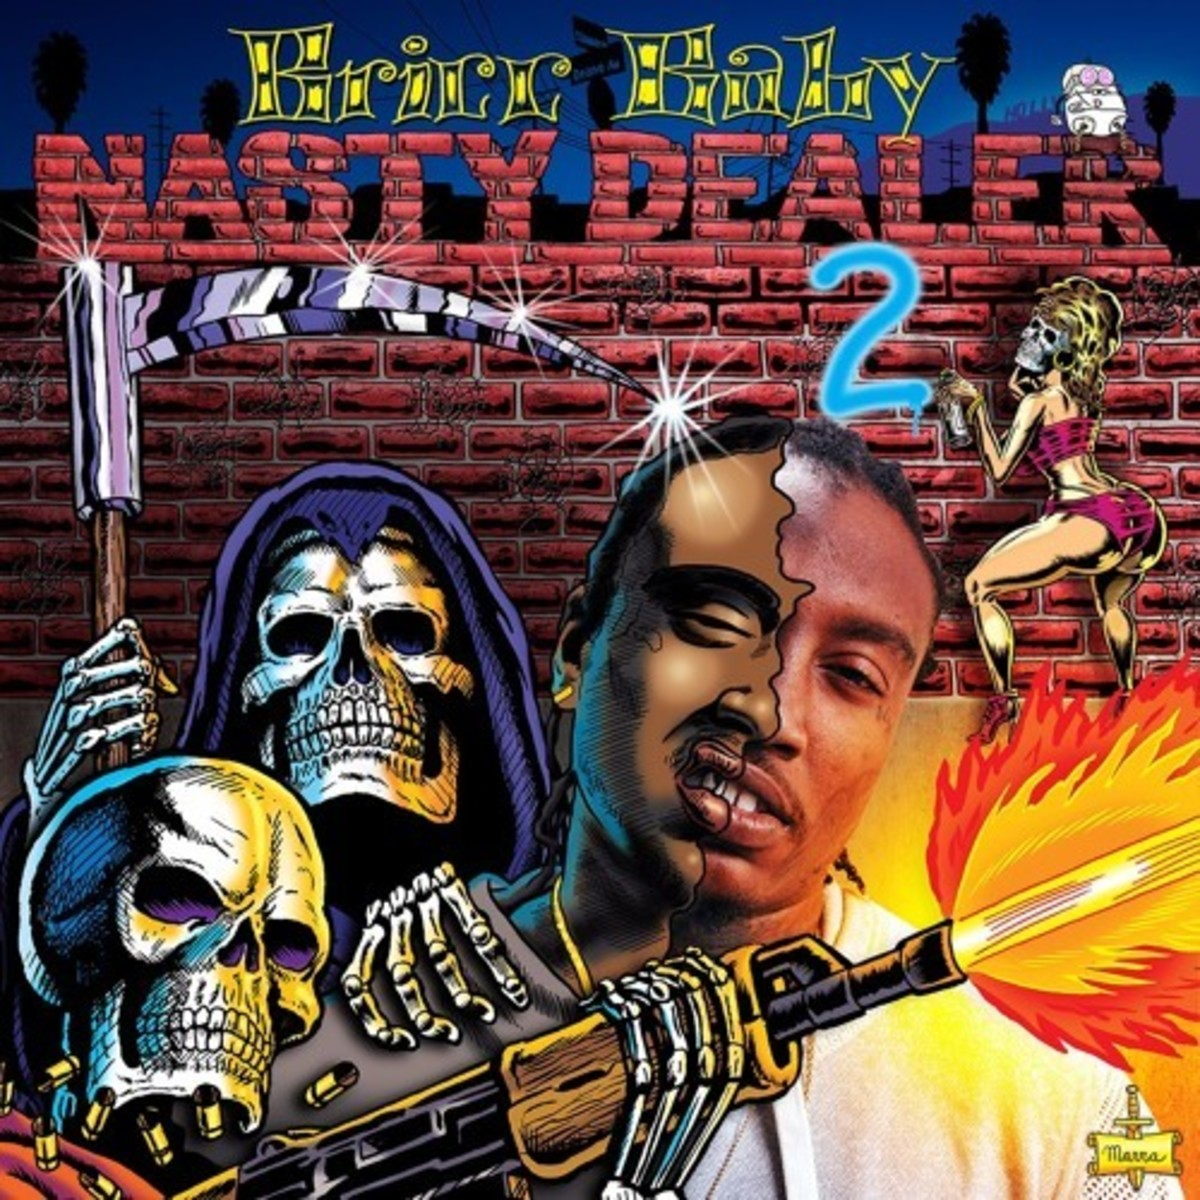 bricc-baby-nasty-dealer-2.jpg